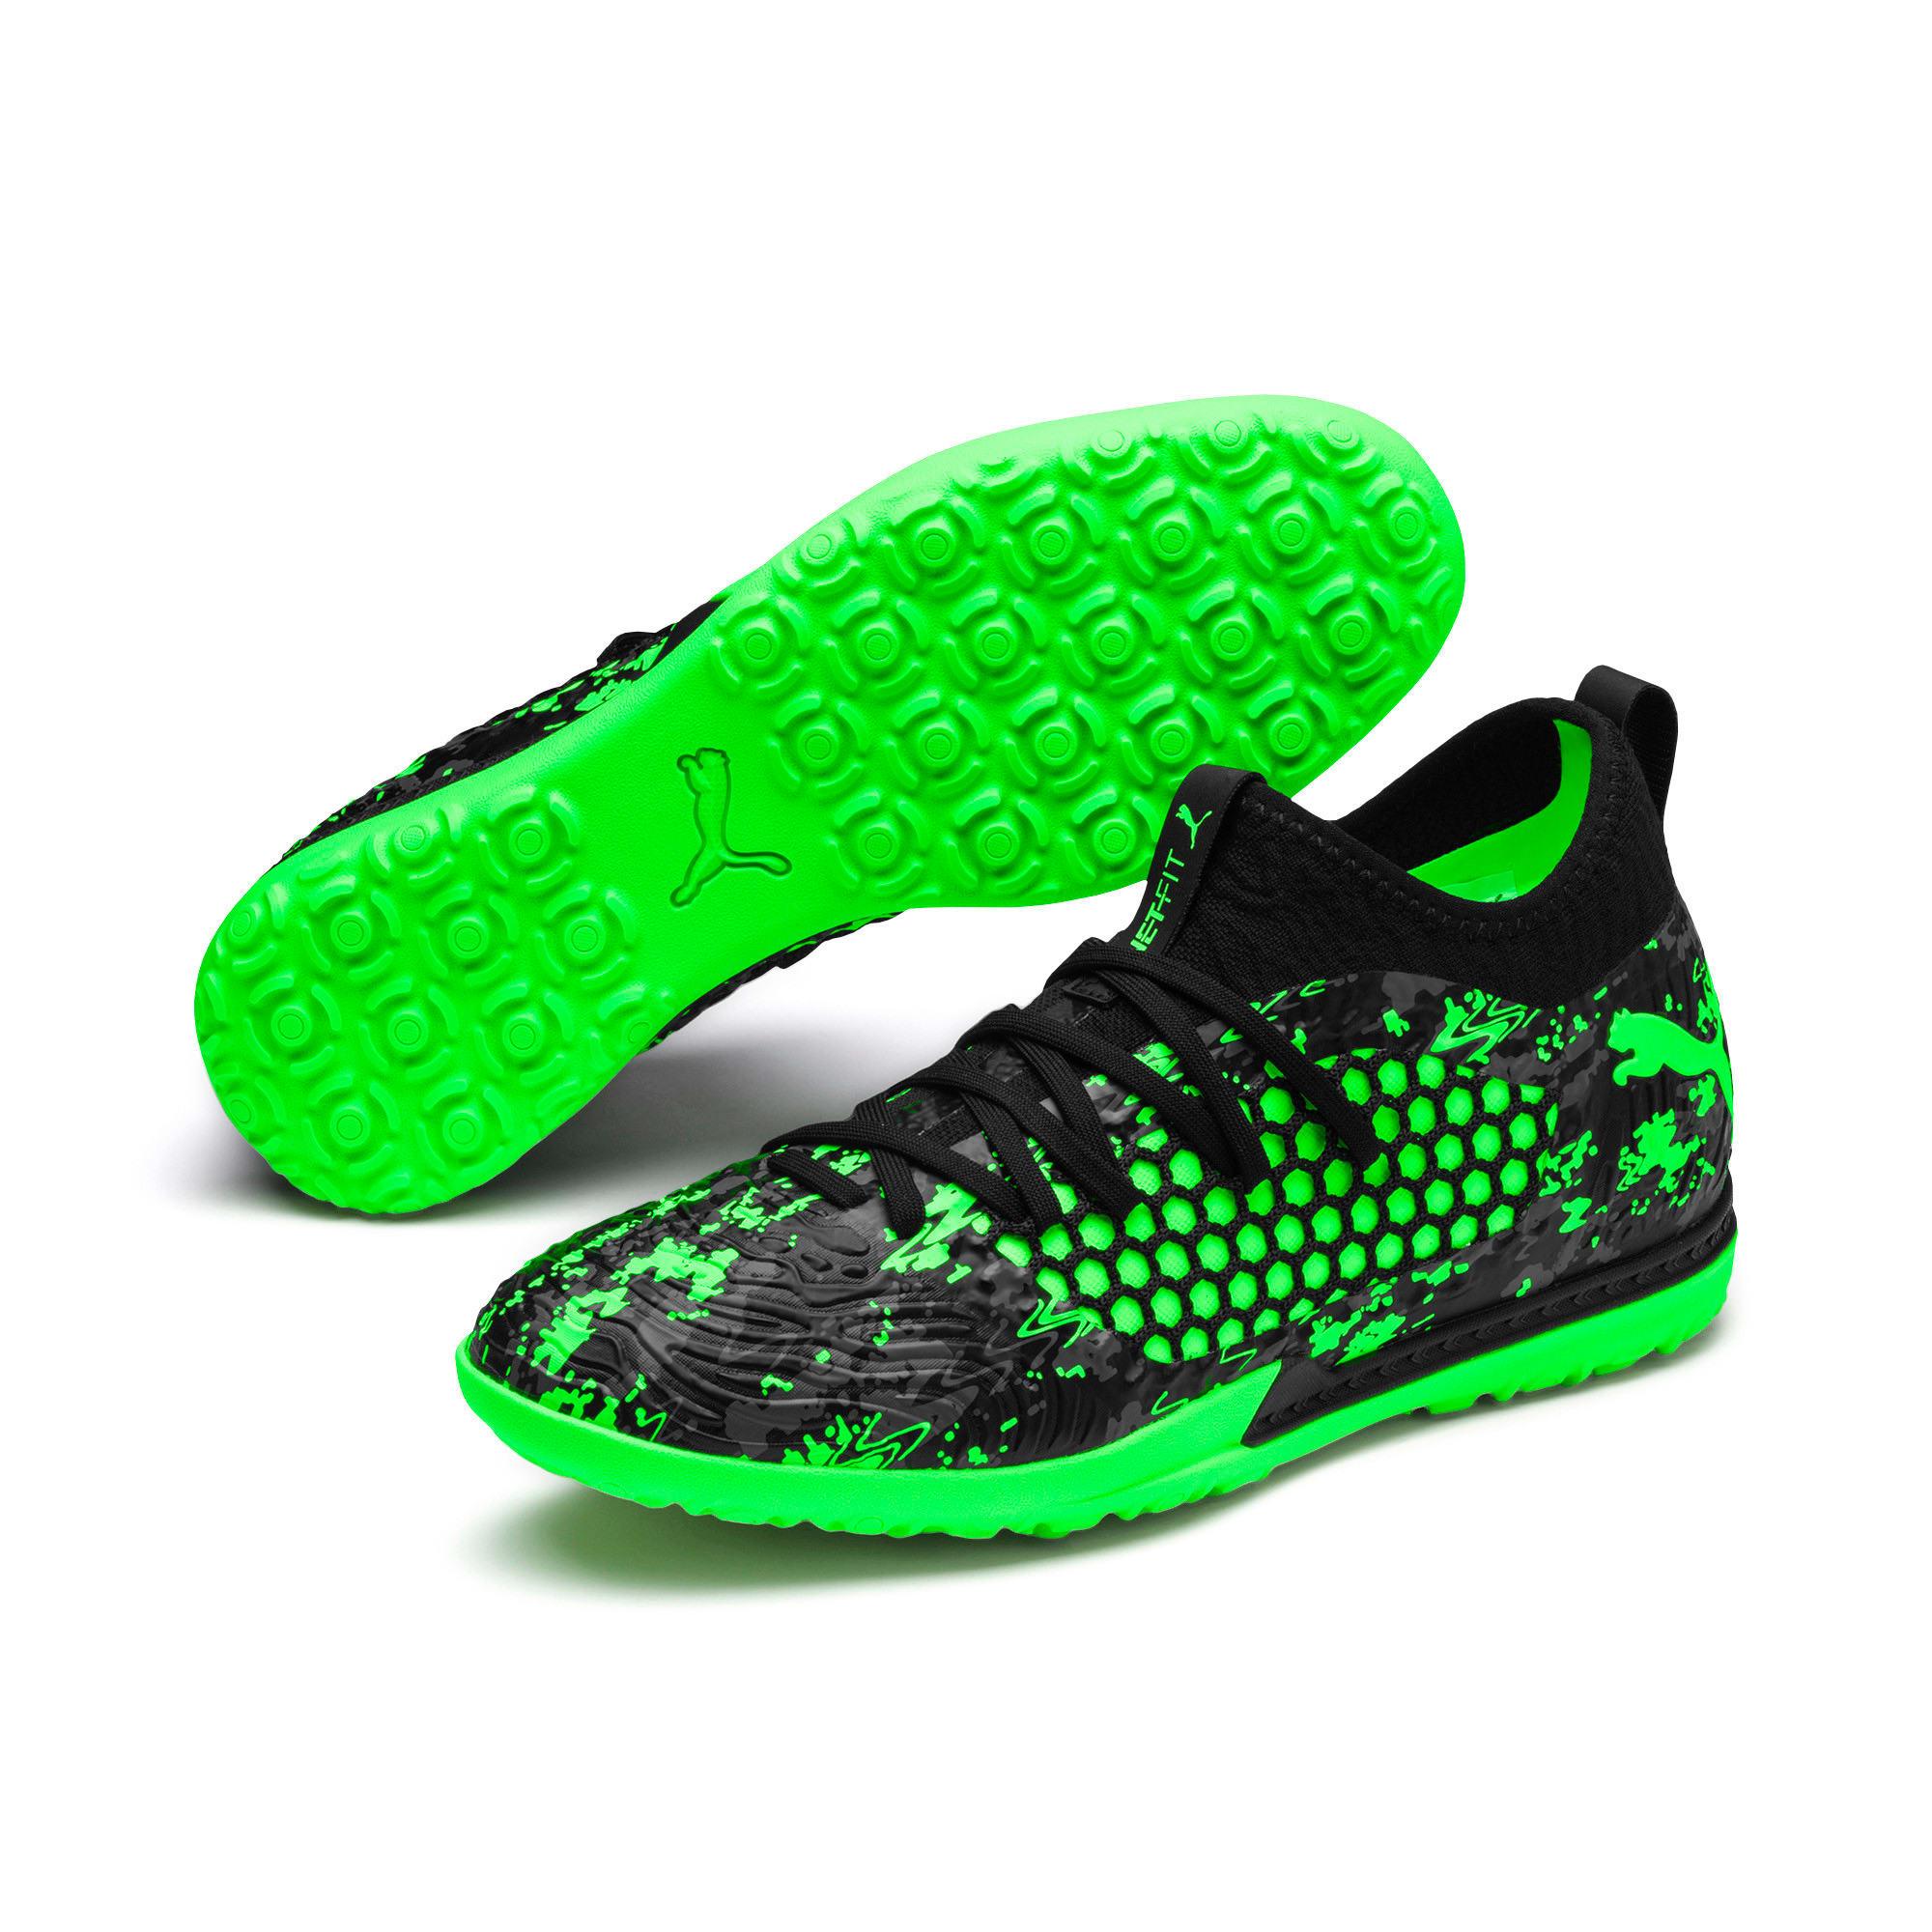 Thumbnail 2 of FUTURE 19.3 NETFIT TT Men's Soccer Shoes, Black-Gray-Green Gecko, medium